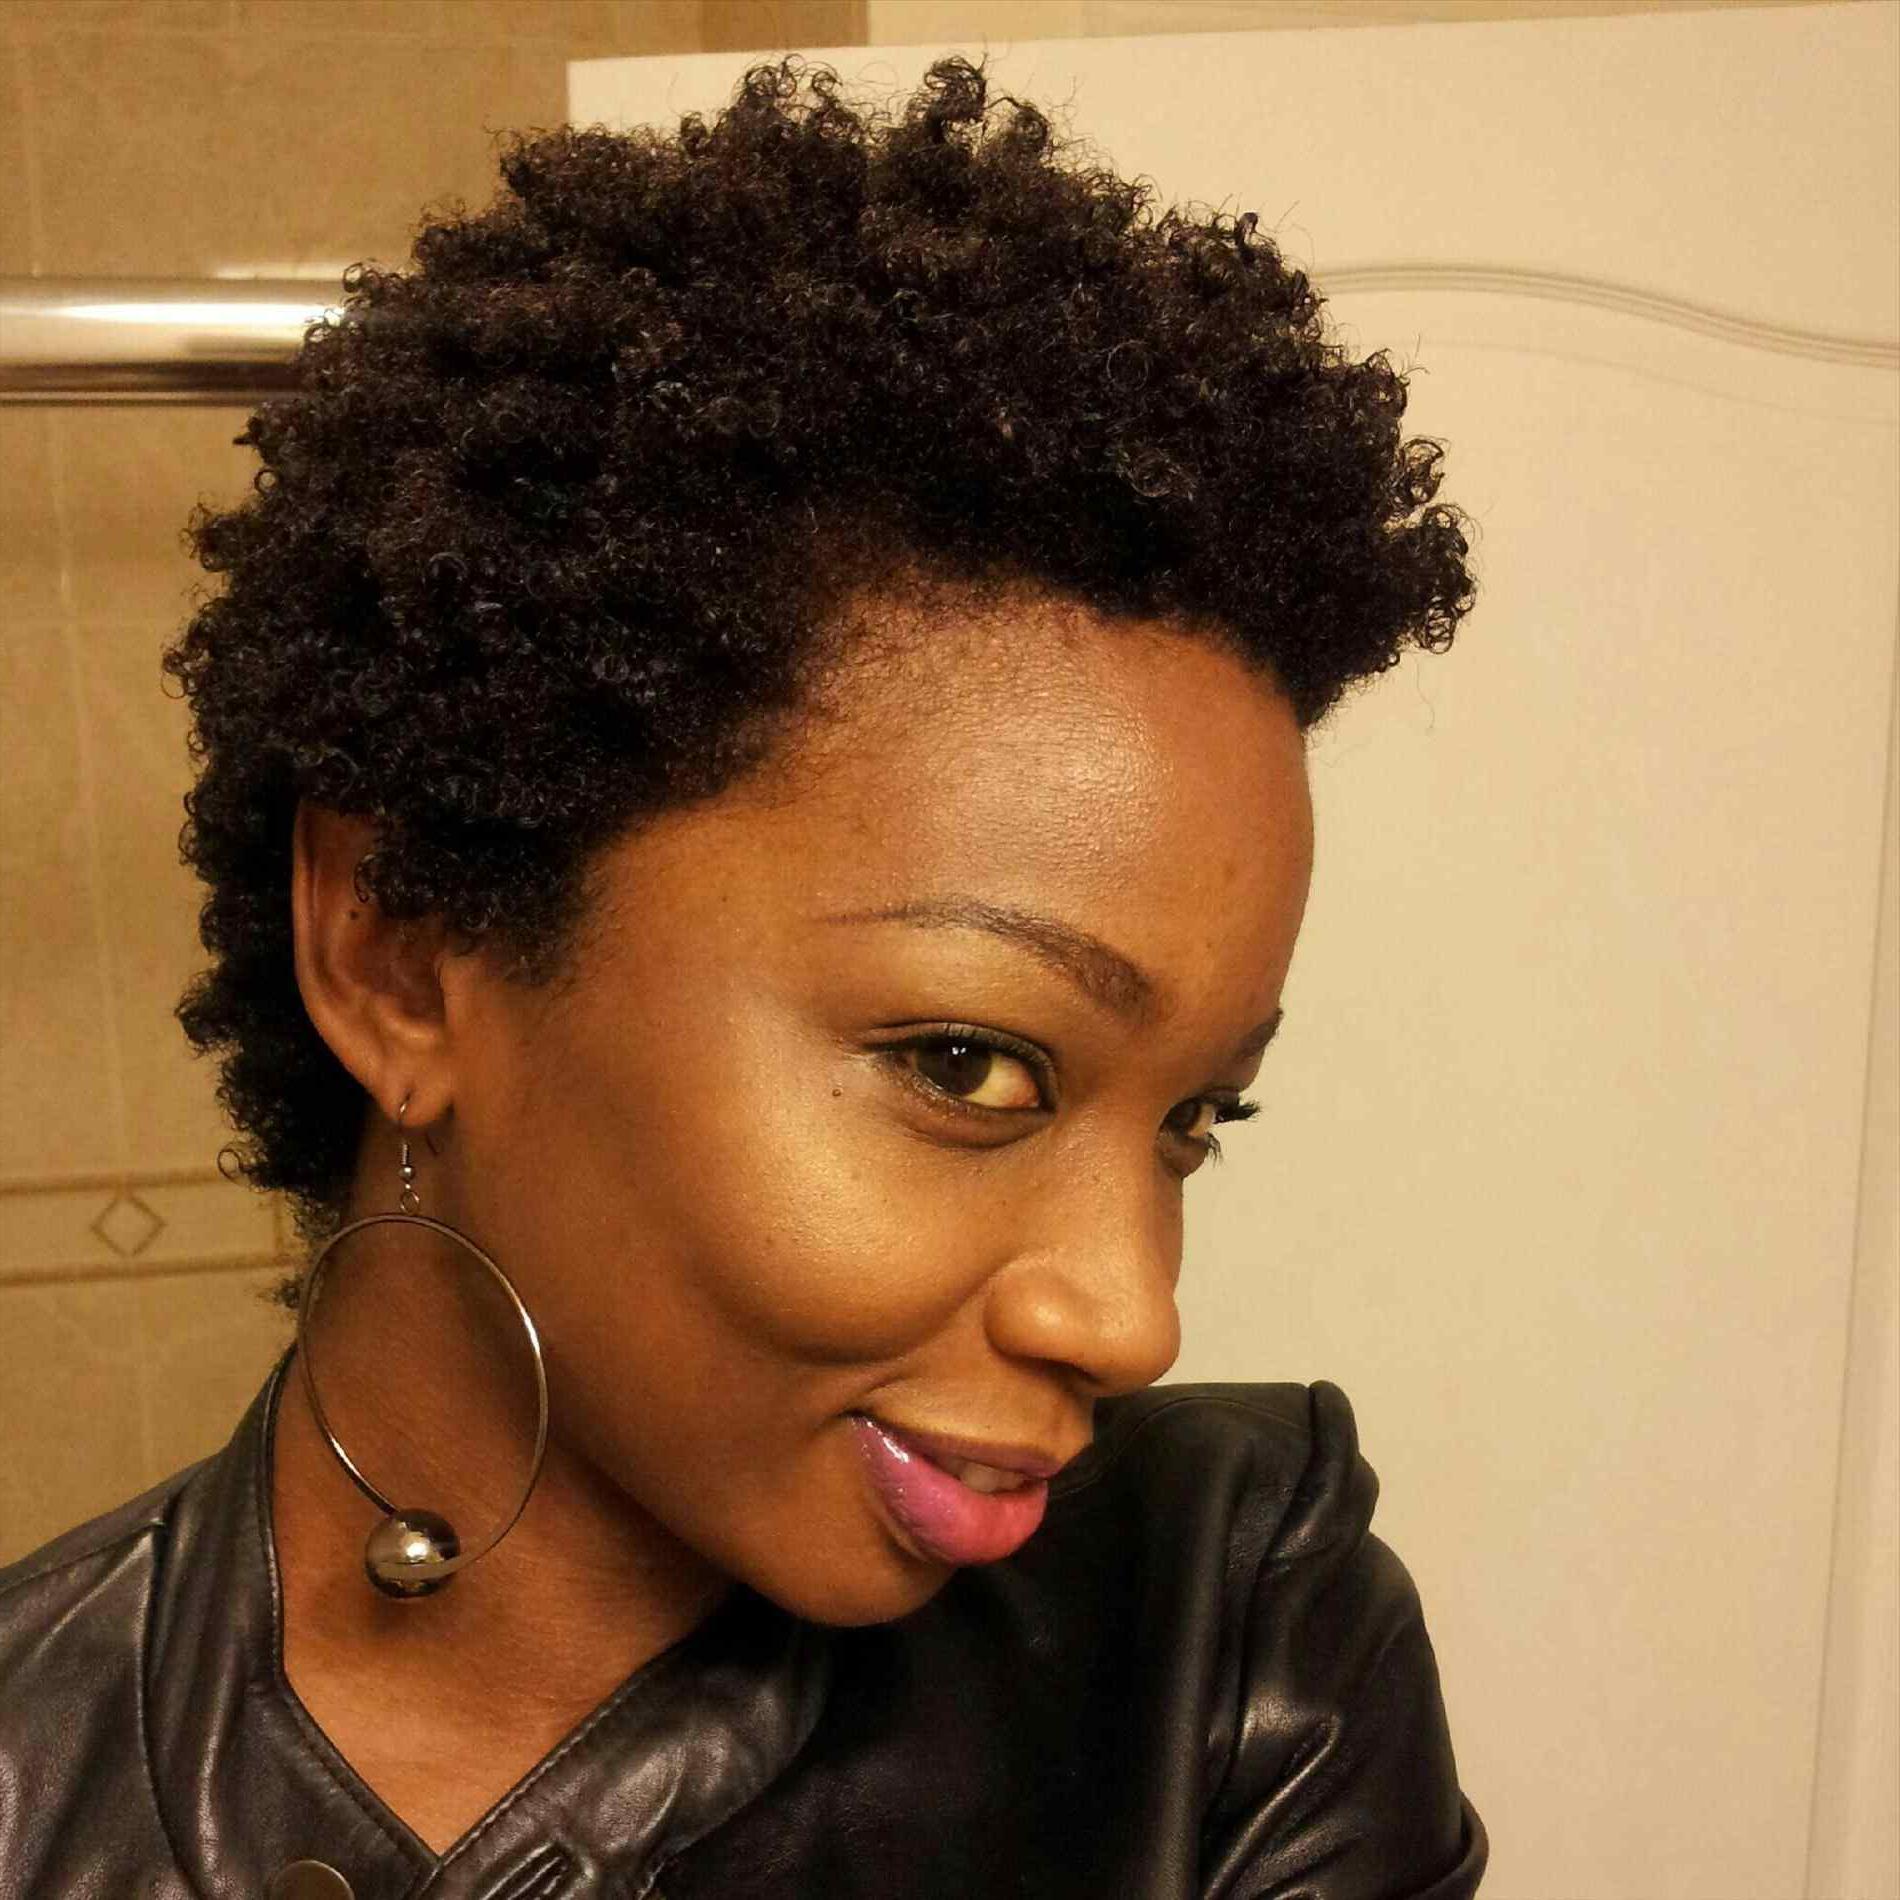 Short Natural Curly Hair Tumblr – Best Short Hair Styles Within Short Curly Hairstyles Tumblr (View 19 of 25)